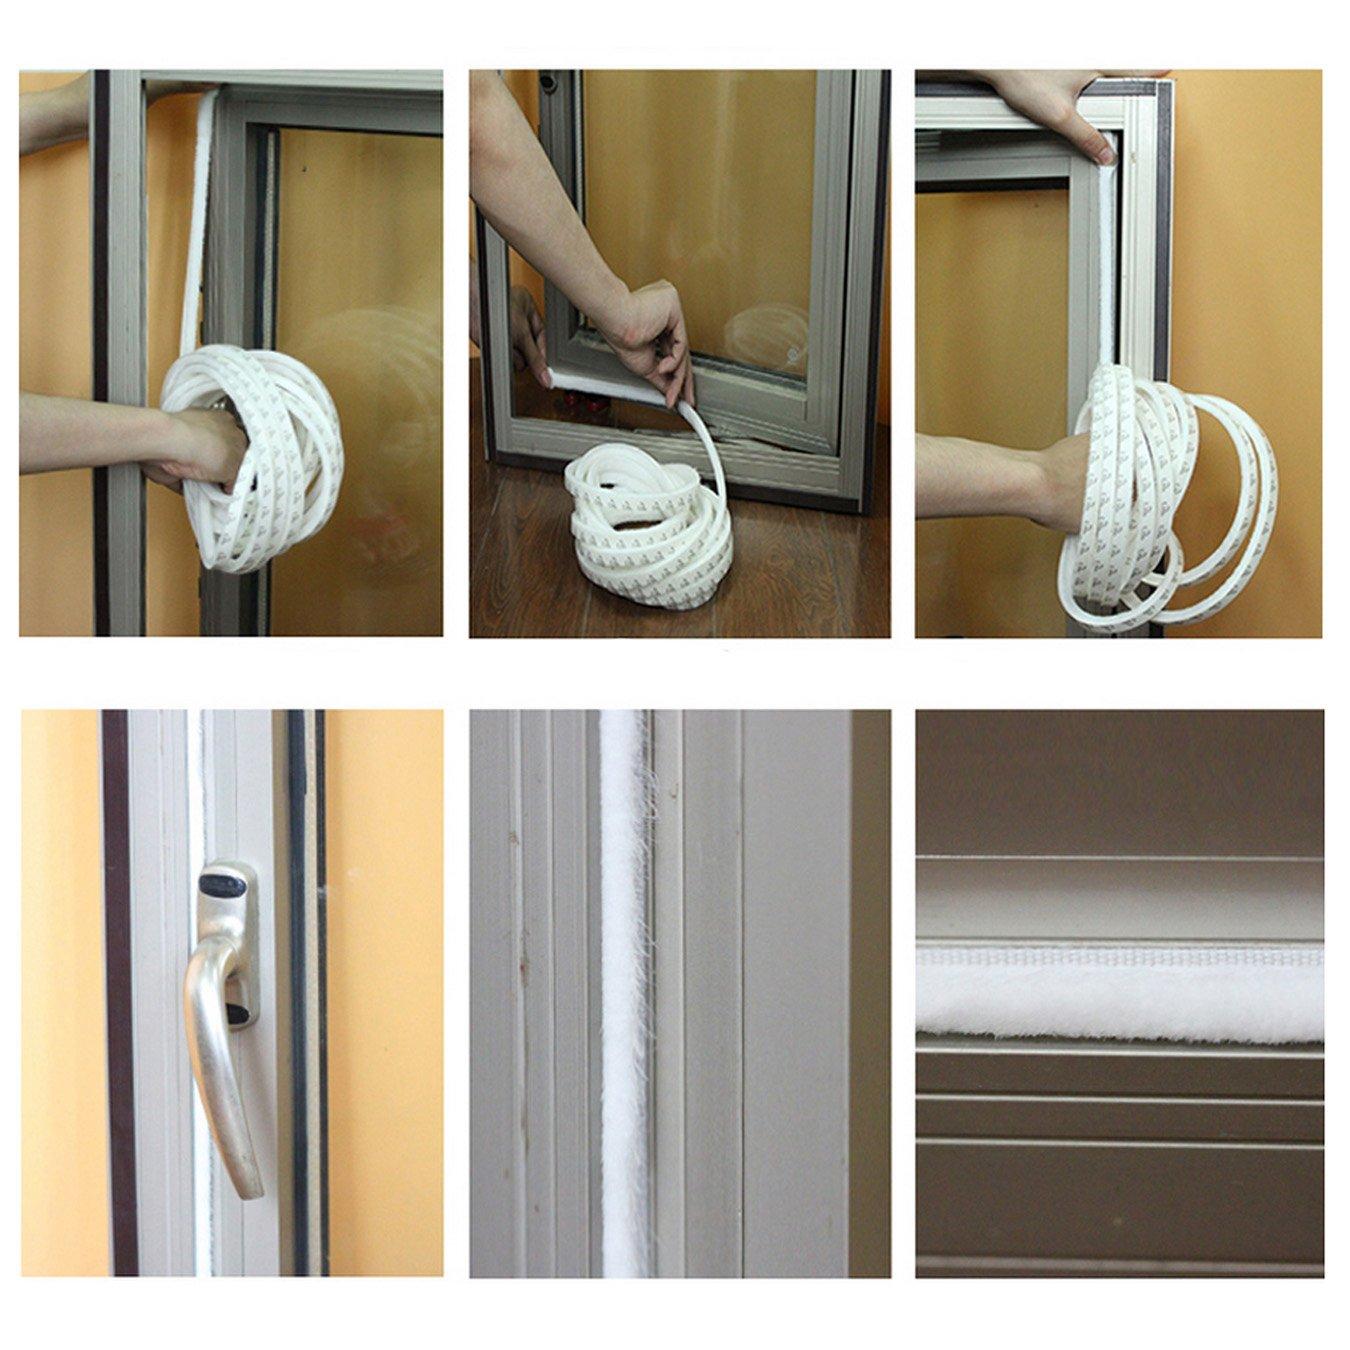 UOOOM 5m Windproof Dustproof Door Window Seal Stripl Self Adhesive Brush Strip 9x5mm